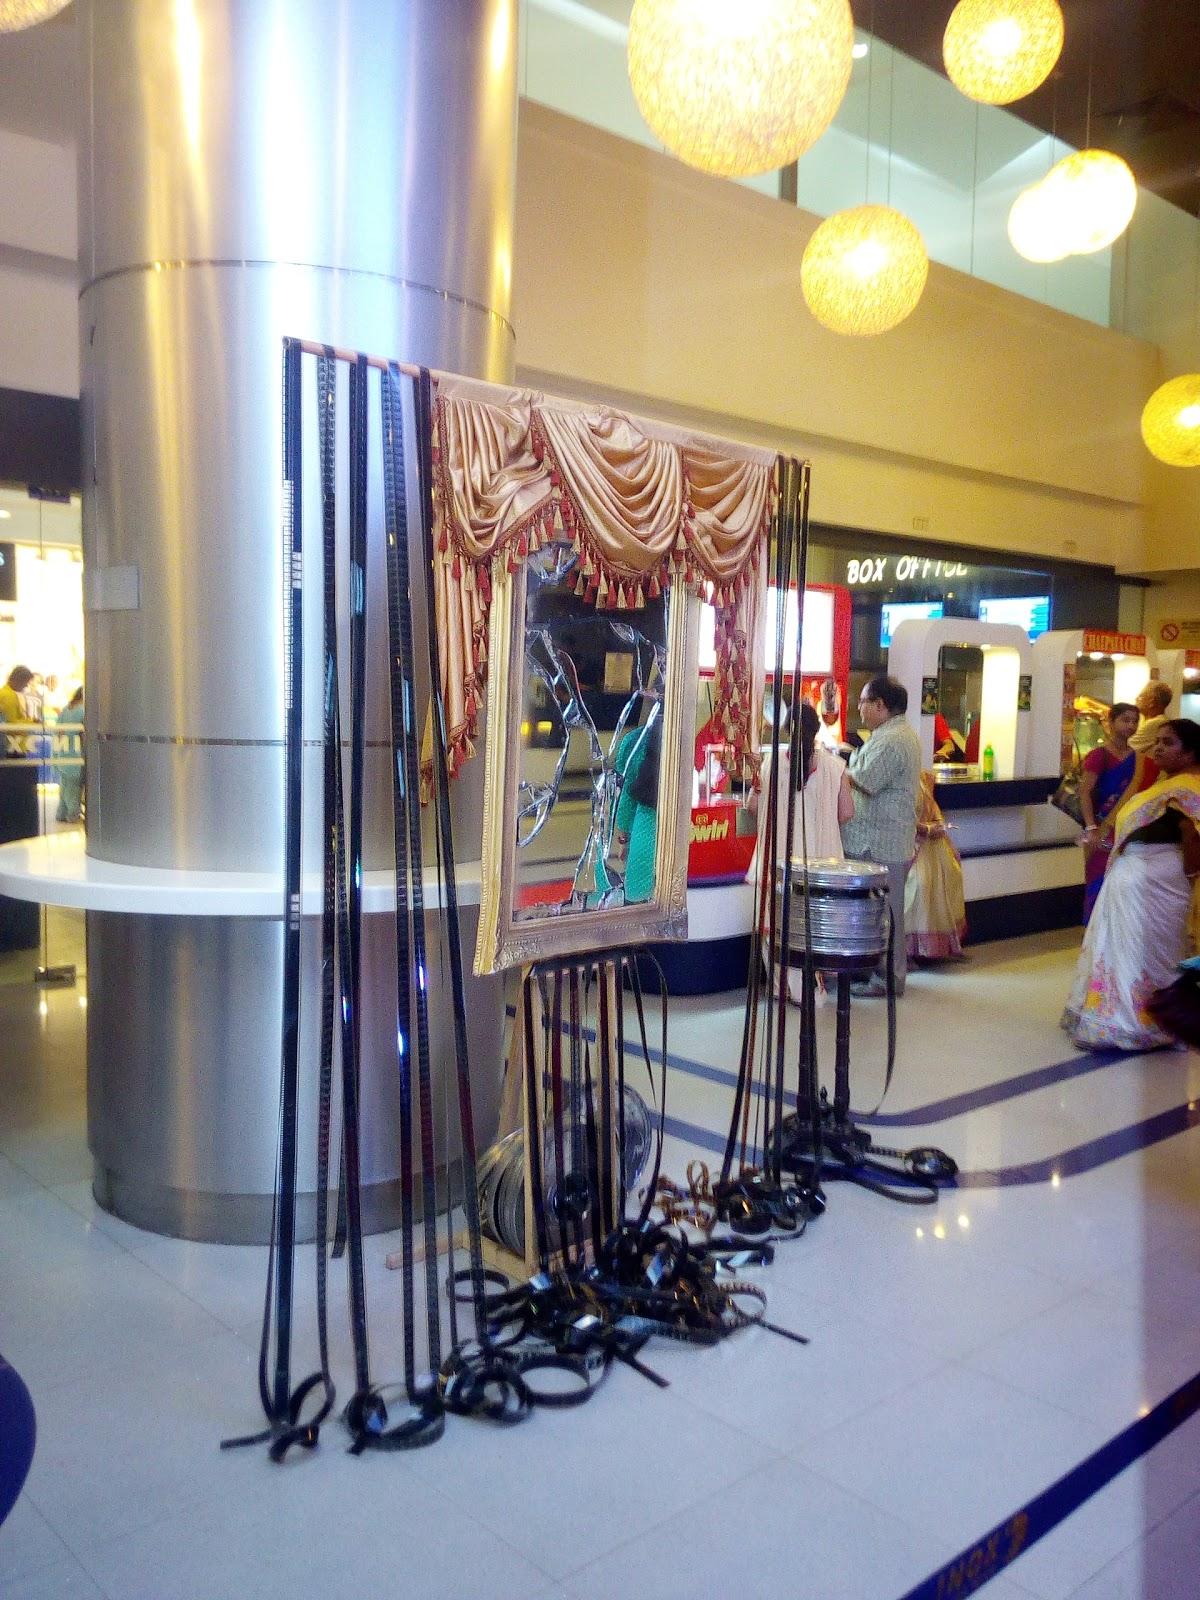 INOX (South City Mall)